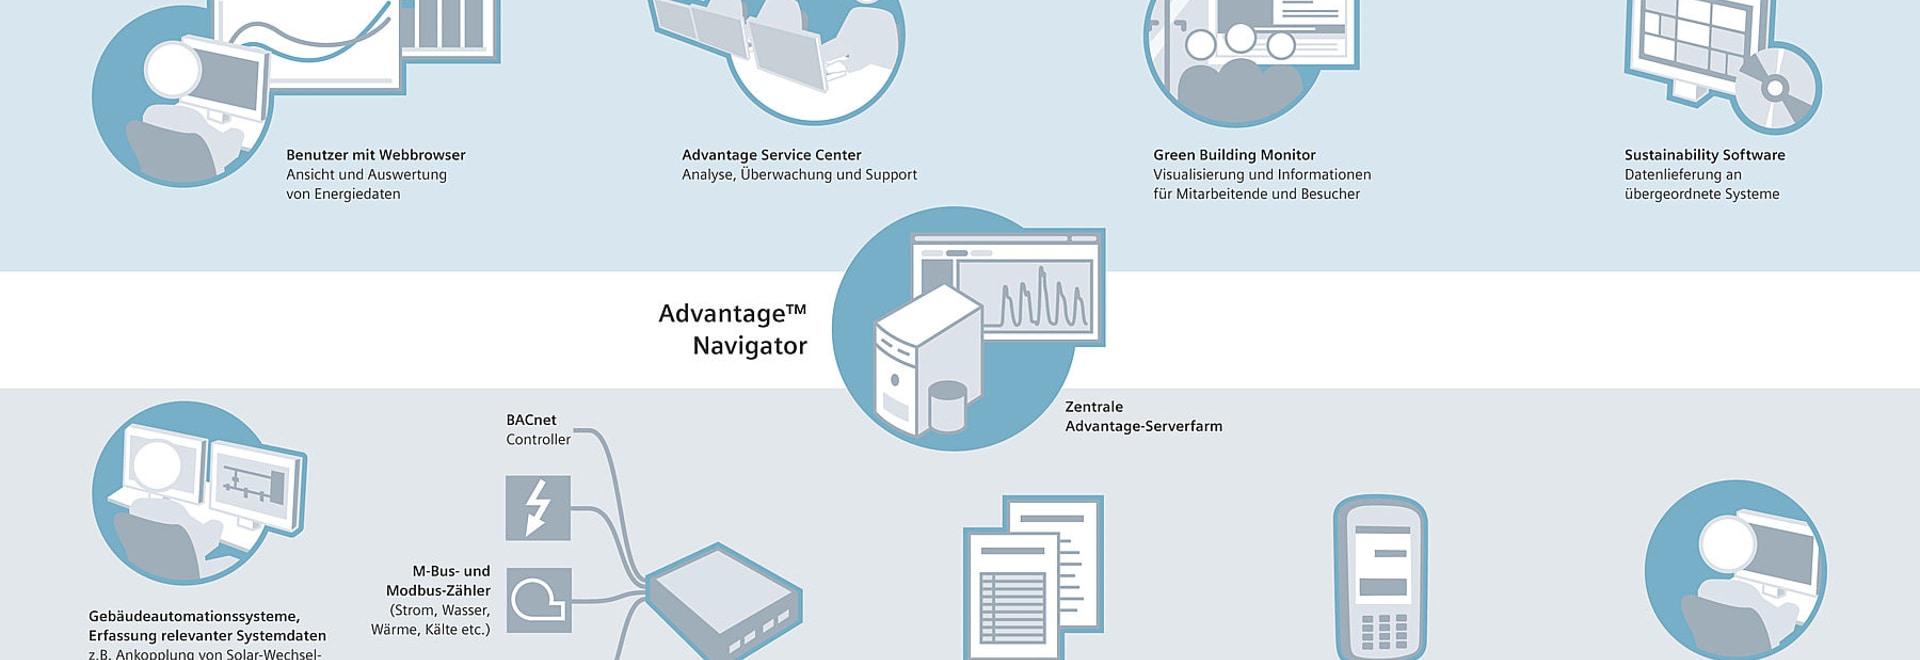 New software platform offers comprehensive energy management for ...